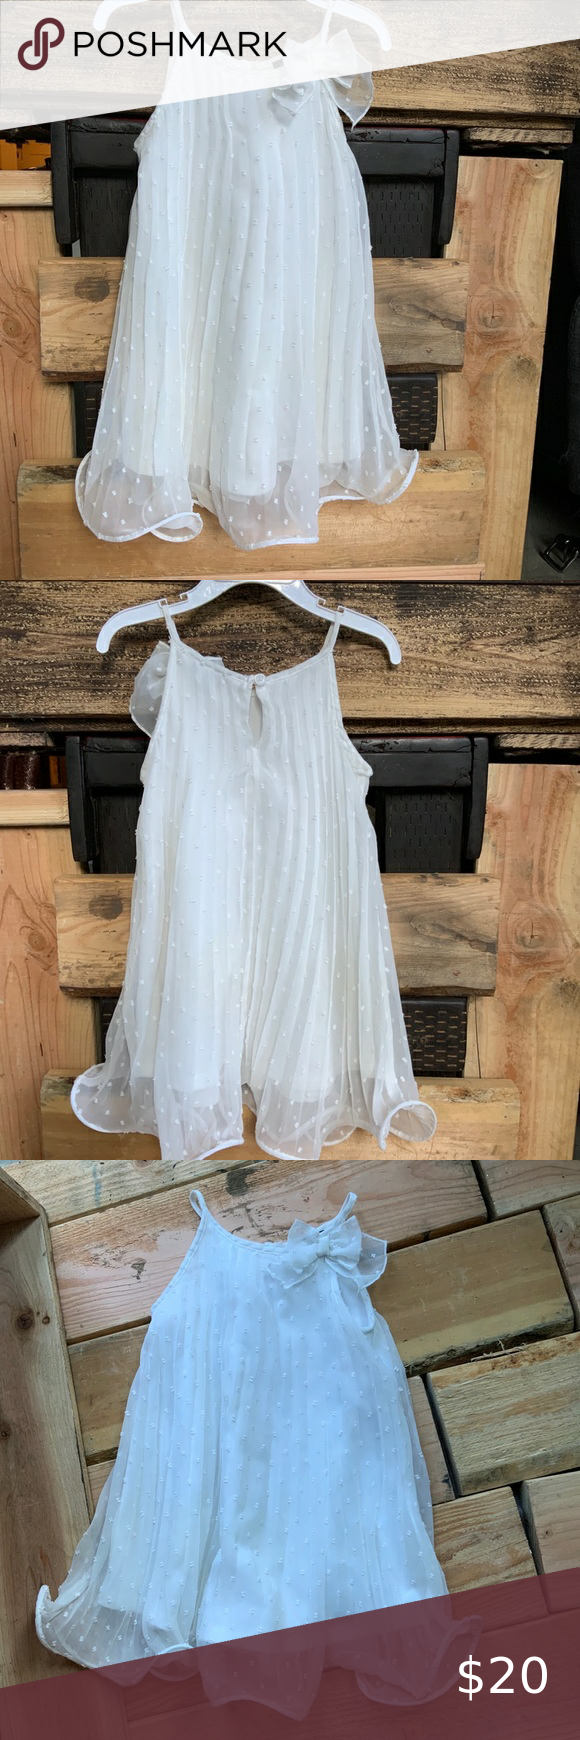 Zunie 3t White Sleeveless Dress White Sleeveless Dress Girls Dresses Size 12 Girls Casual Dresses [ 1740 x 580 Pixel ]